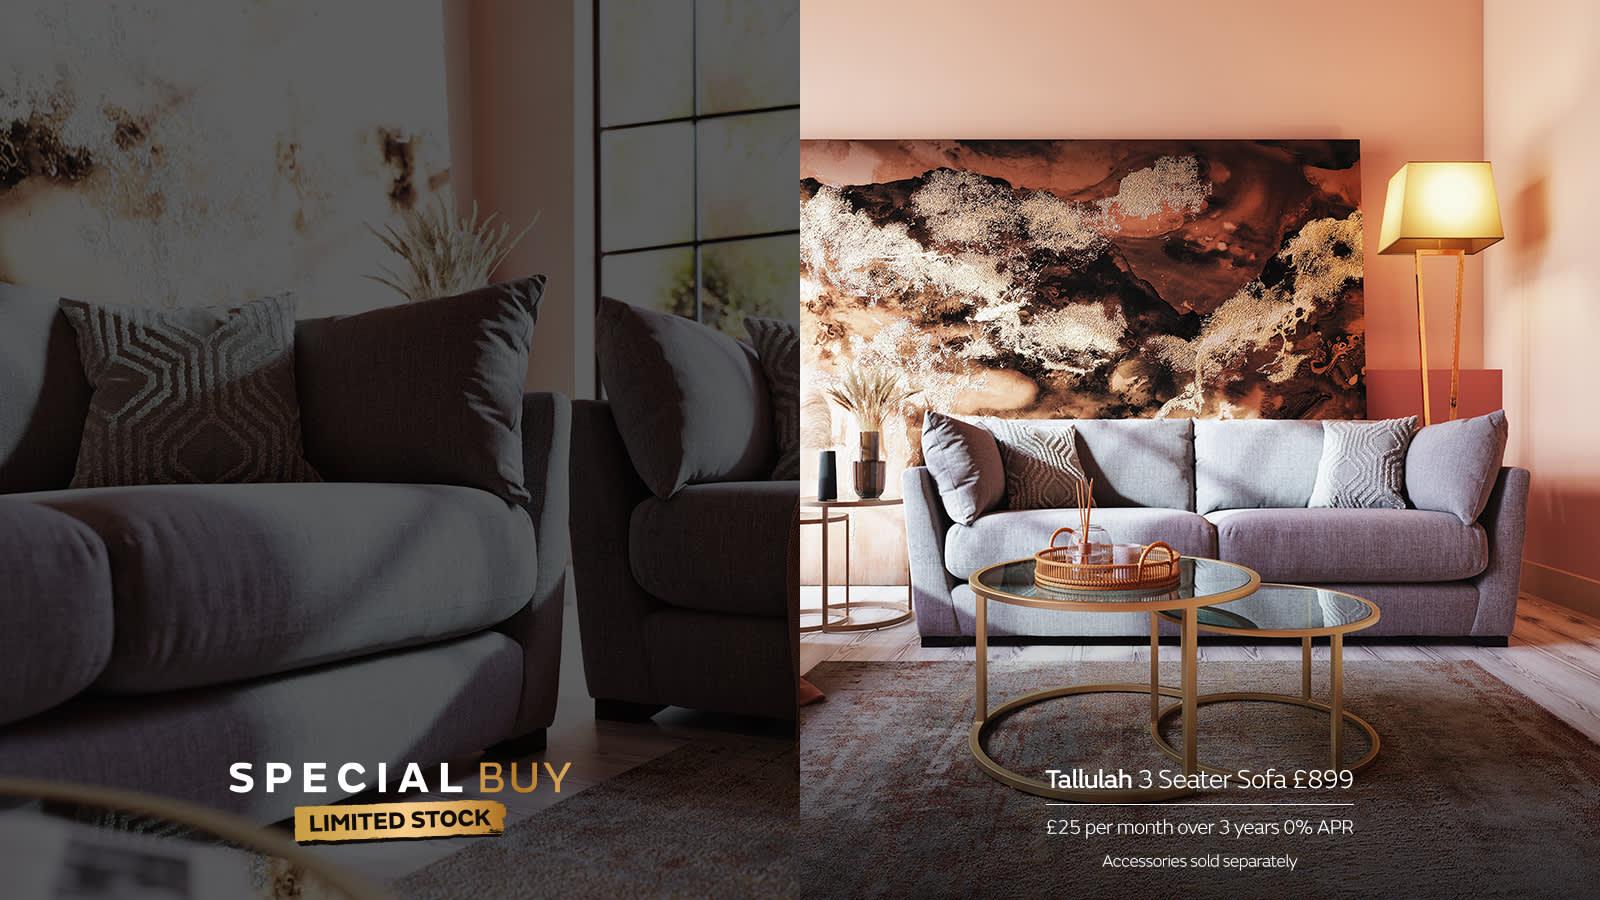 Sofology Tallulah Special Buy Grey Sofa